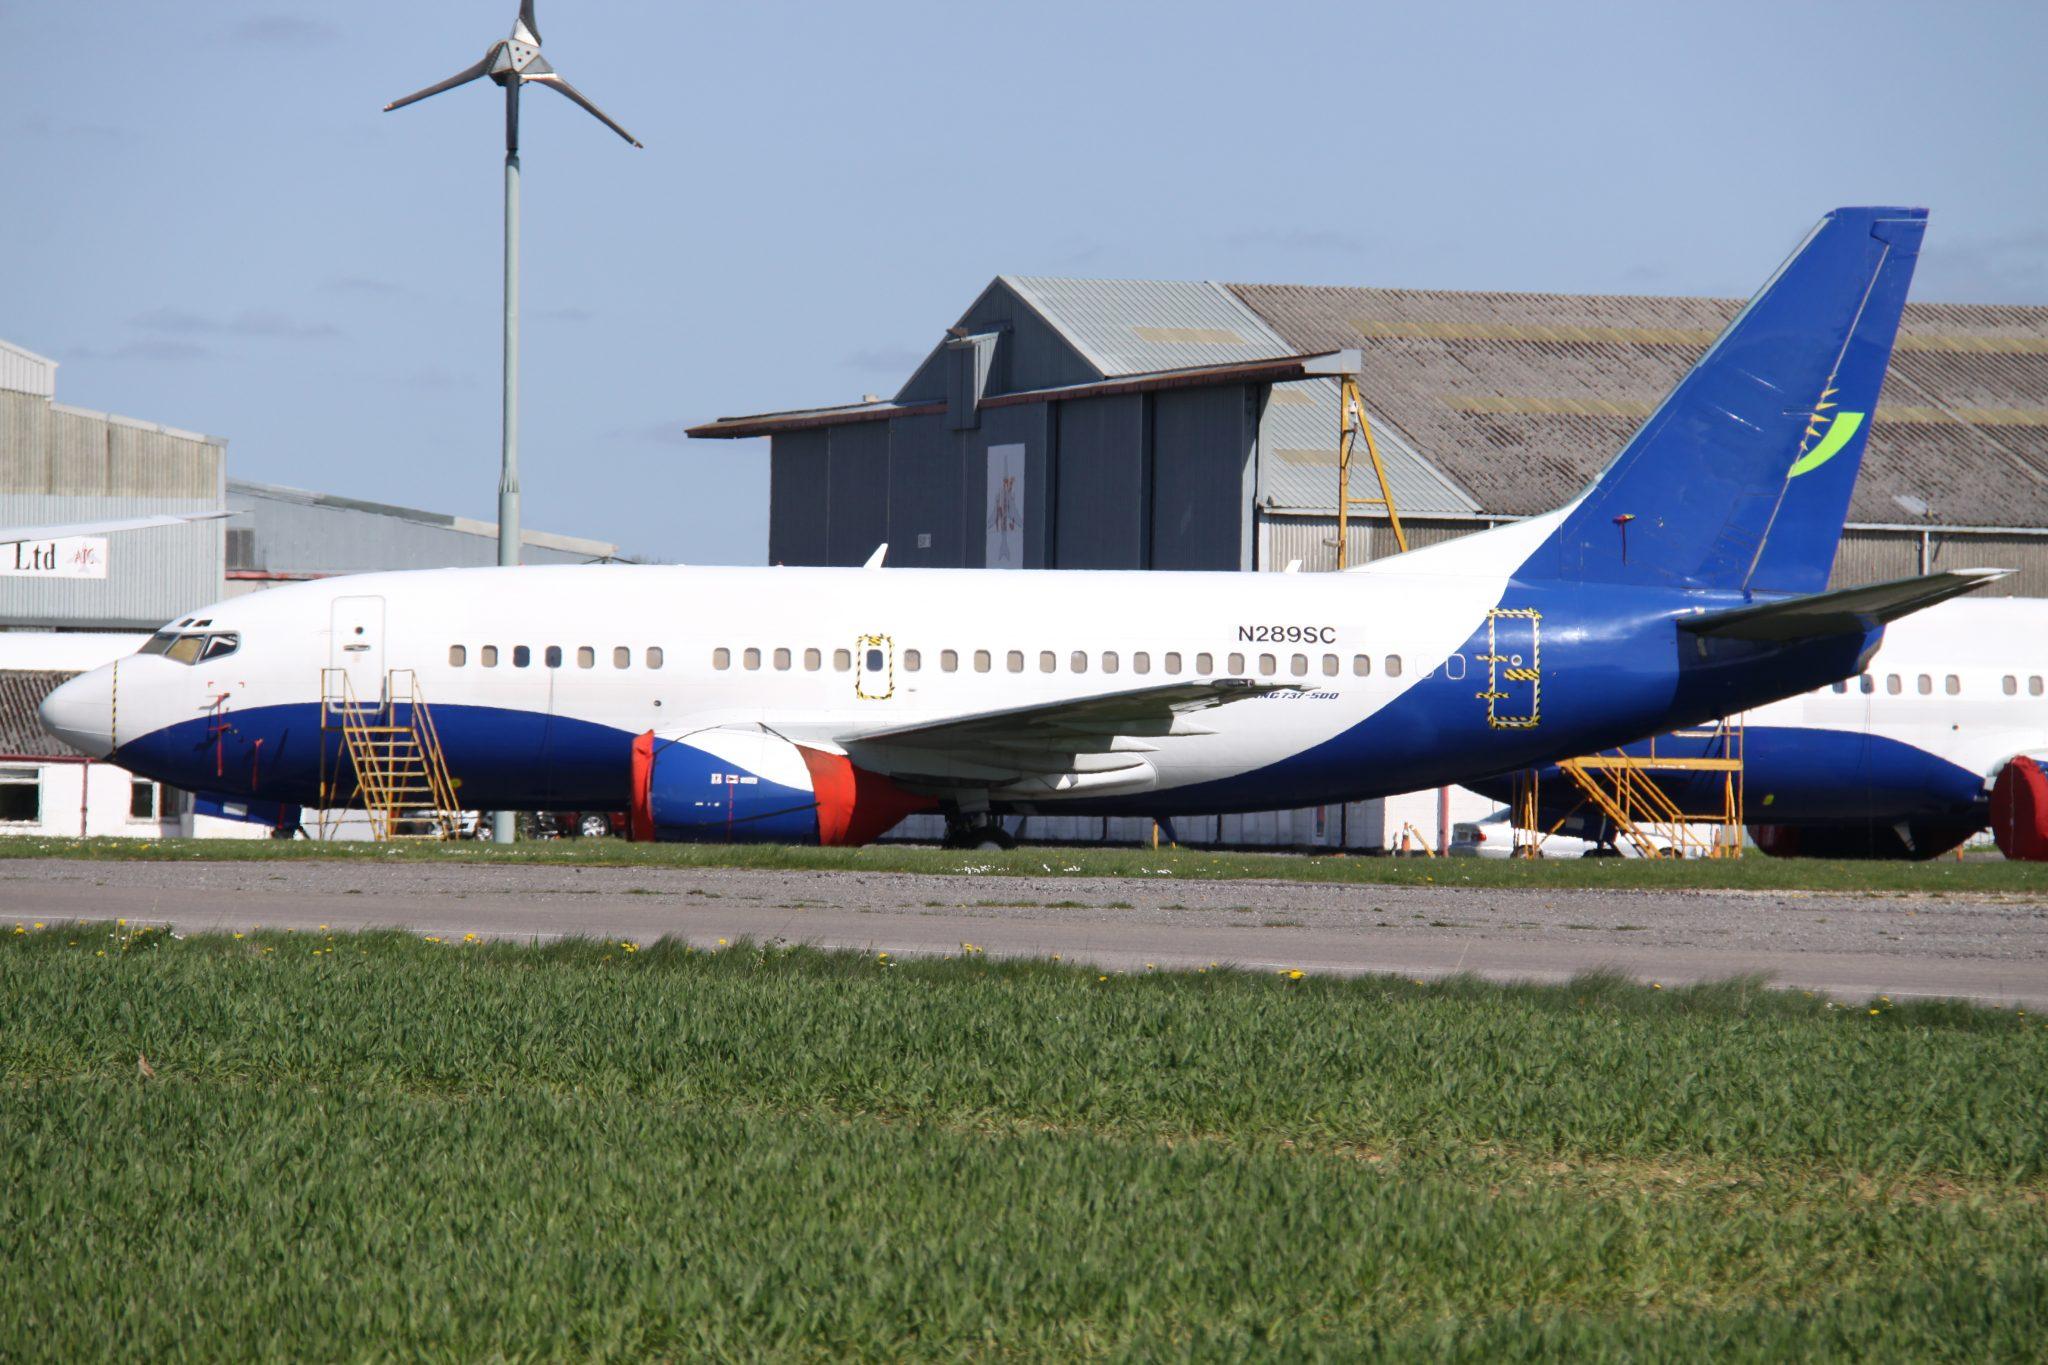 A RwandAir jet on the ground.